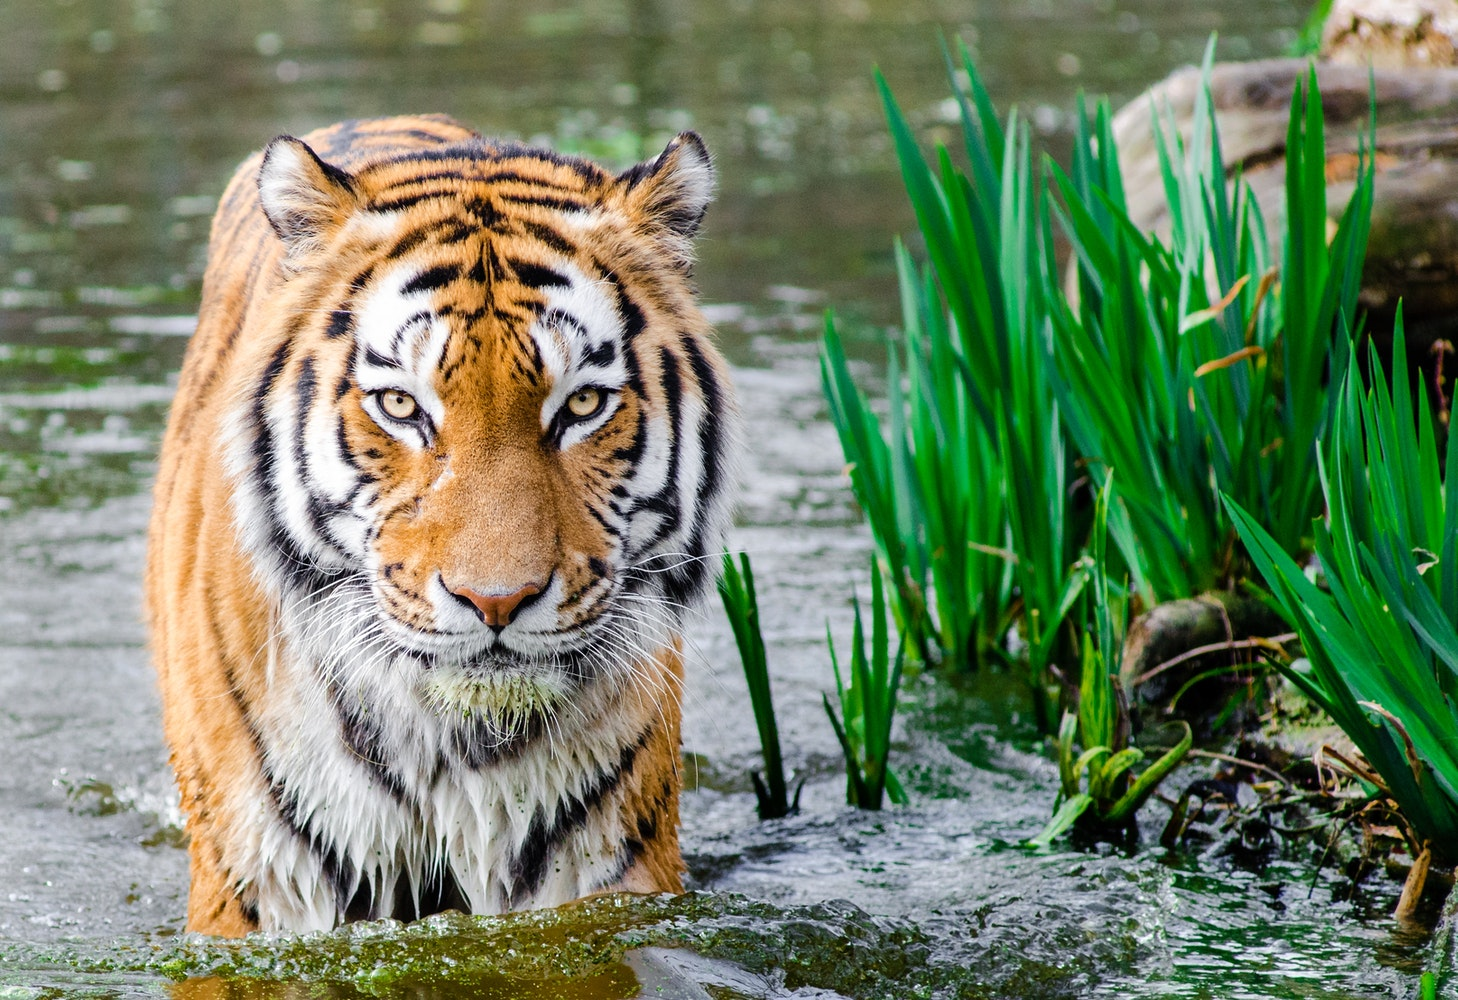 free stock photos of animals 183 pexels